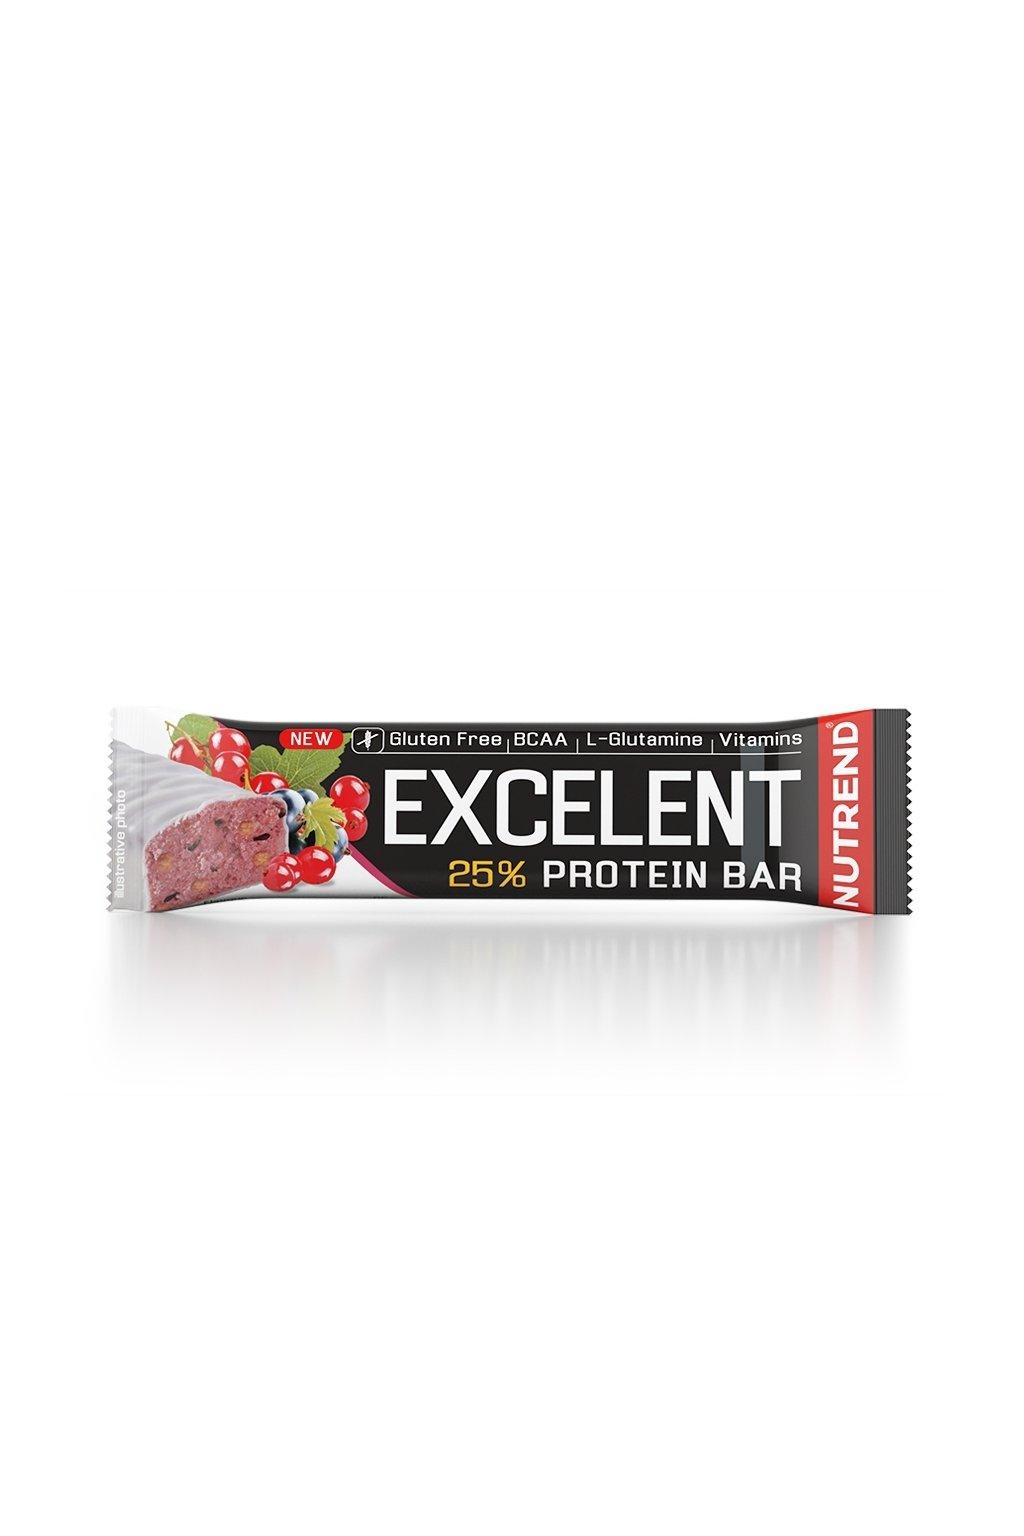 EXCELLENT protein bar černý rybíz s brusinkami, 85g